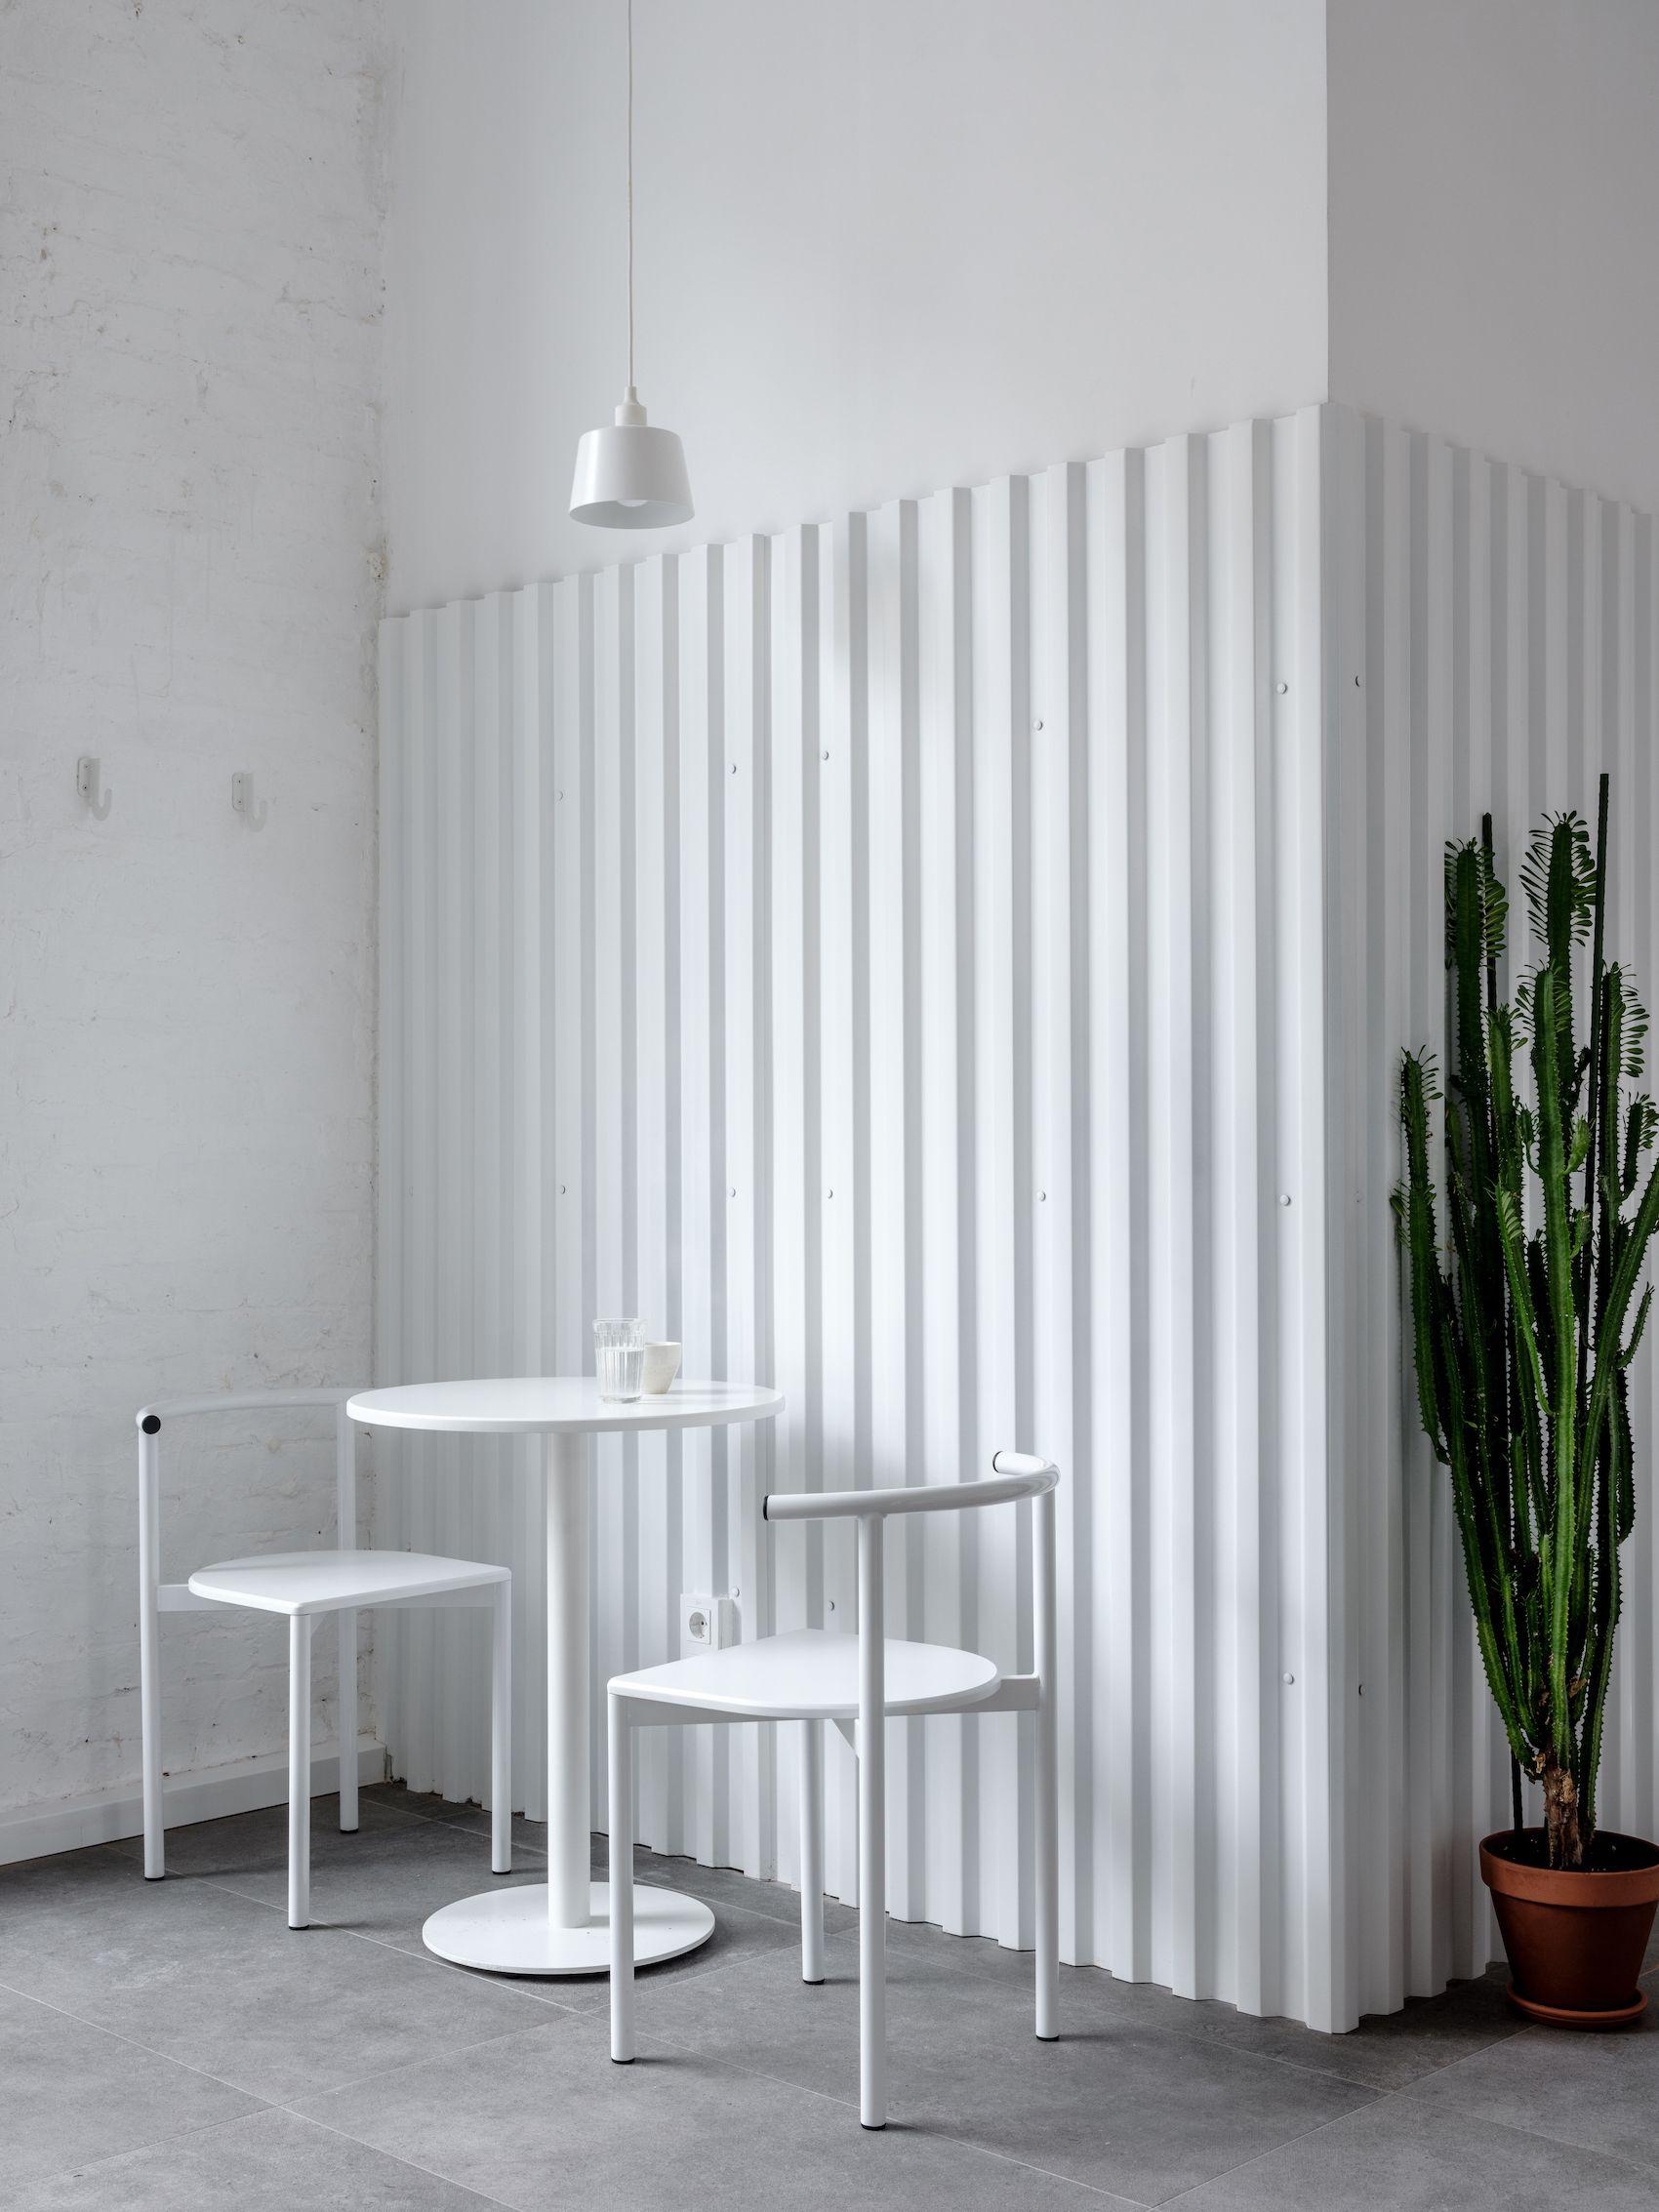 Bloomnbrew interiors walls floors pinterest